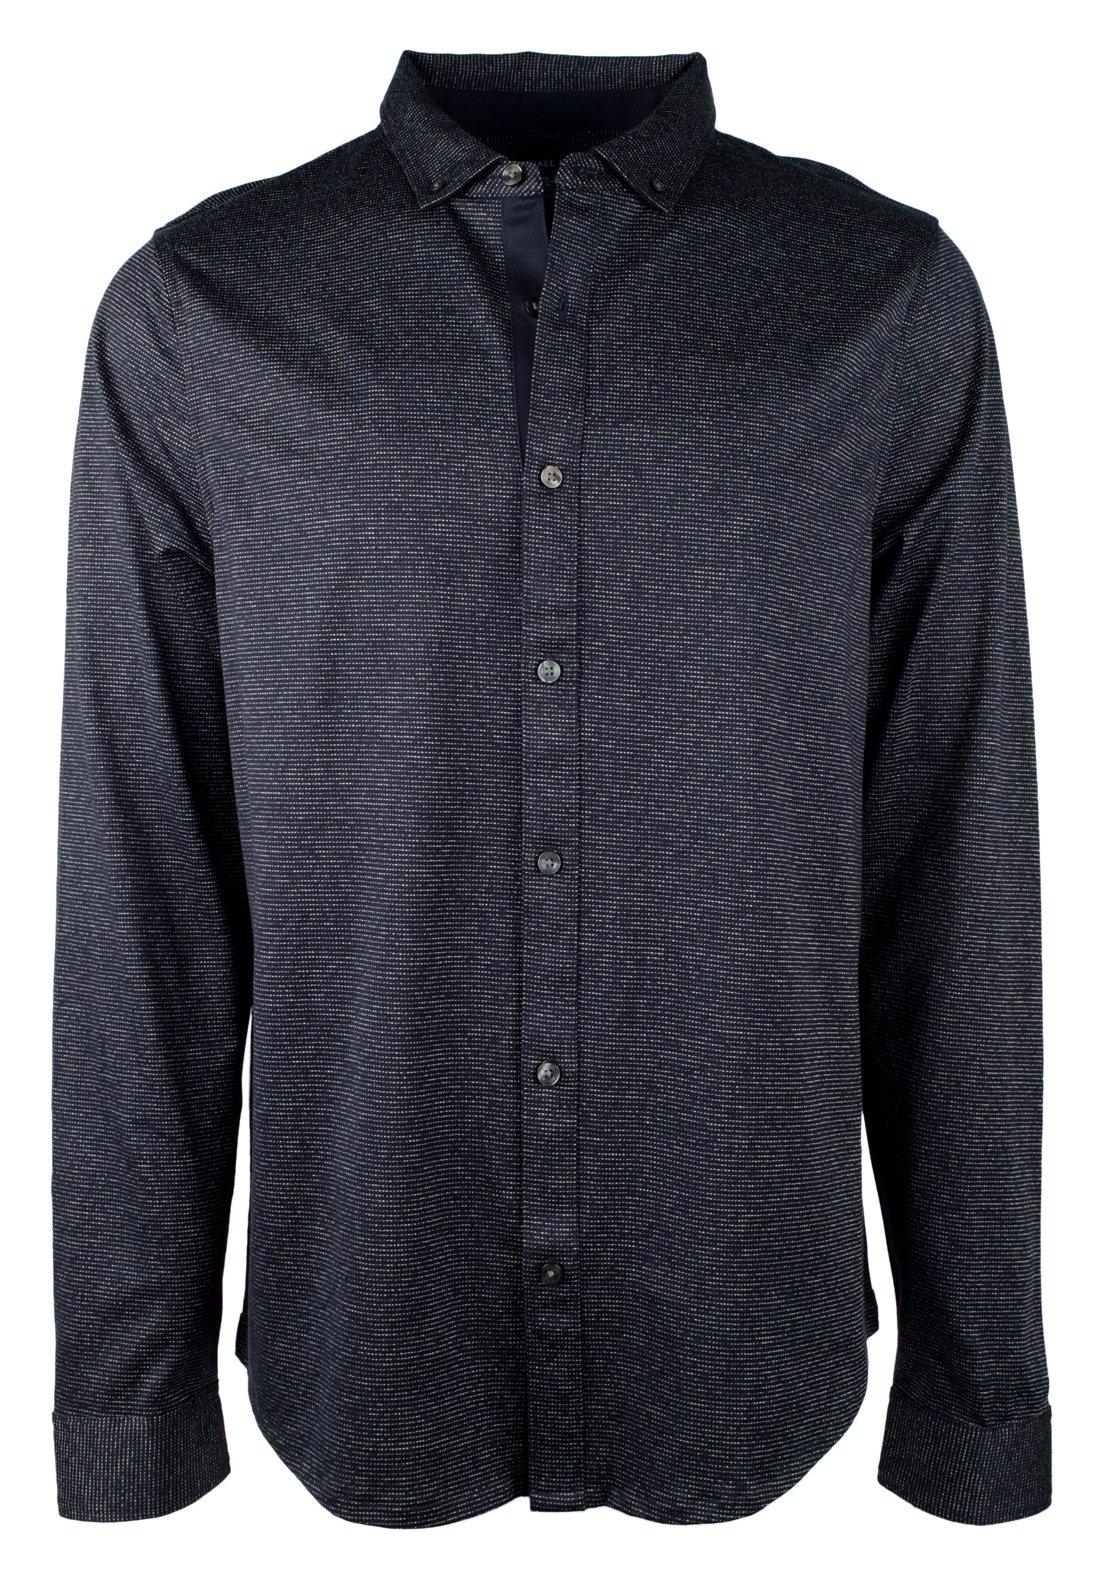 Michael Kors Men's Abstract Patterned Cotton Shirt-M-XXL